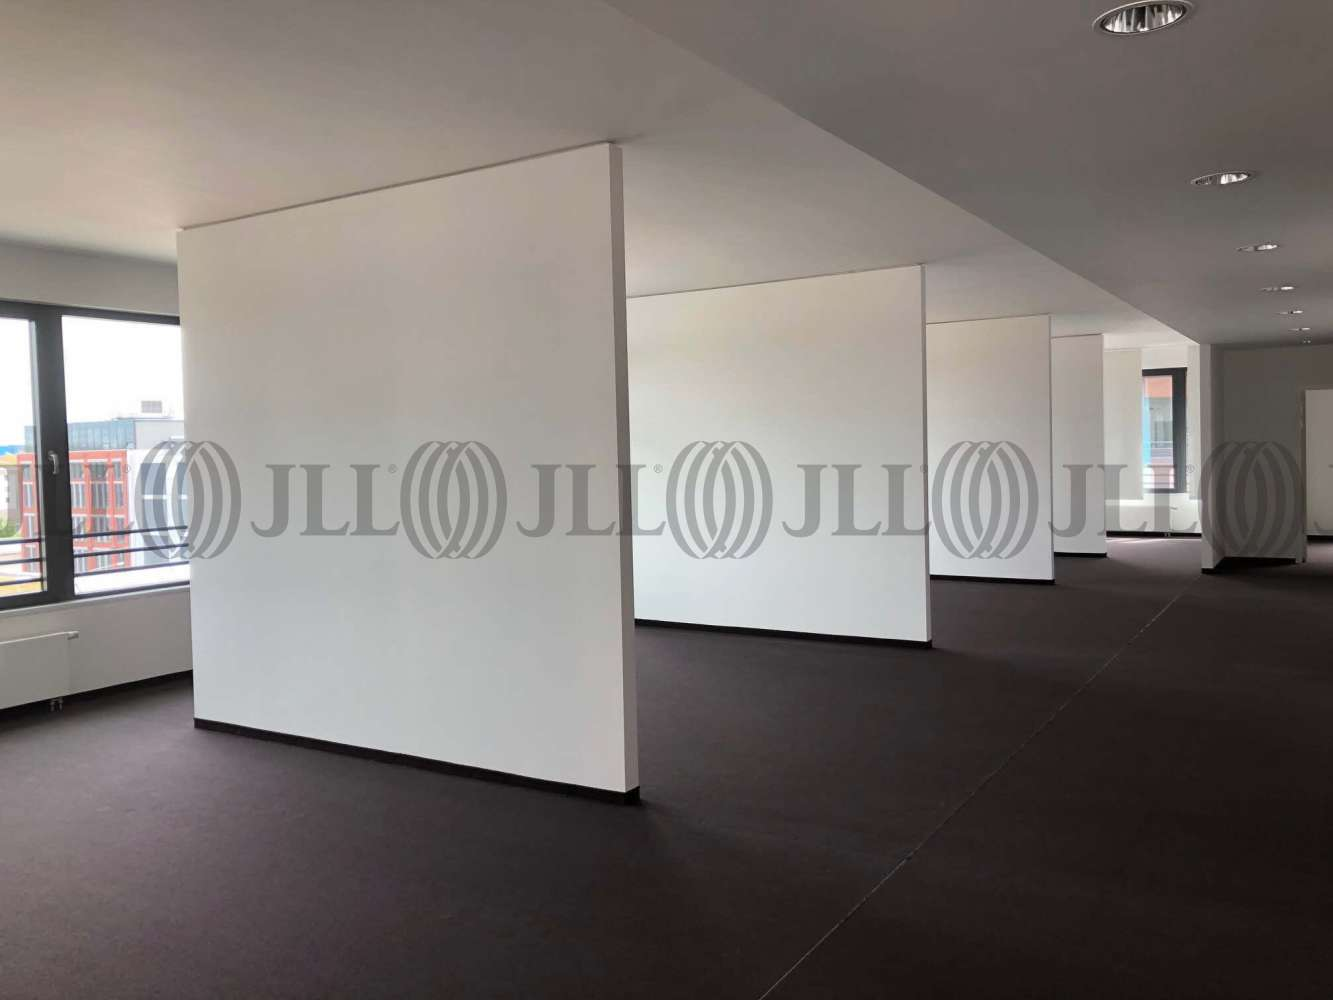 Büros Frankfurt am main, 60314 - Büro - Frankfurt am Main, Ostend - F1213 - 10157929